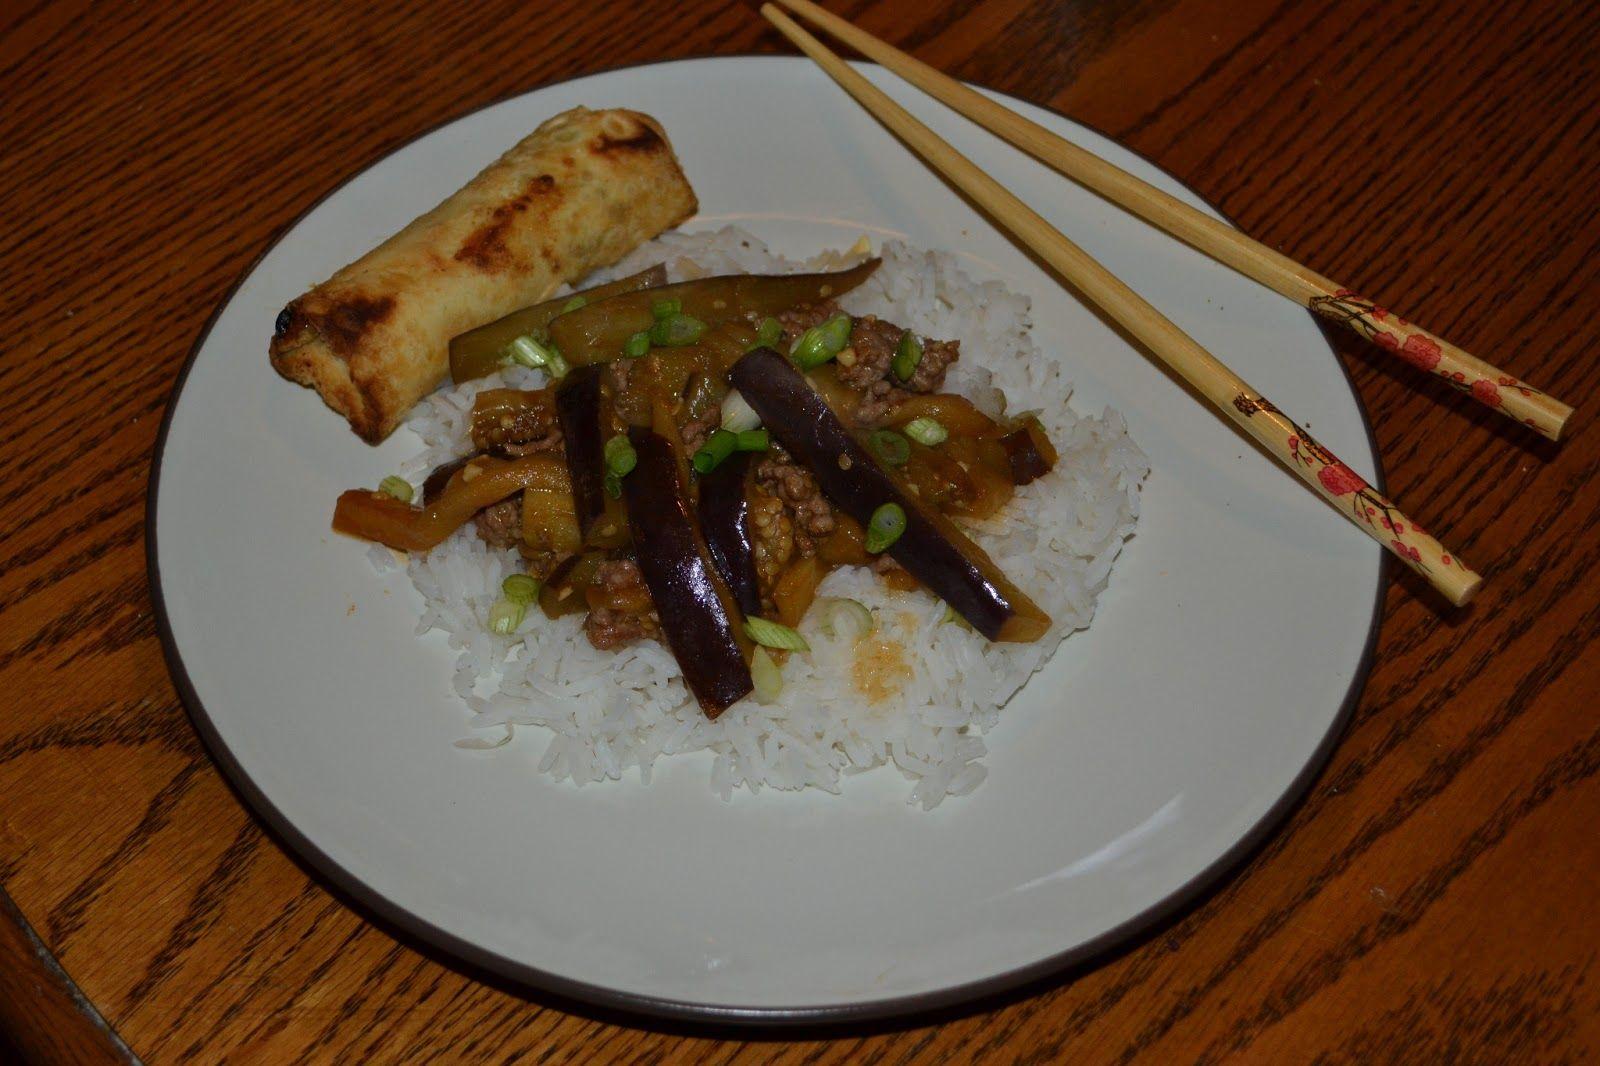 Eggplant in Garlic Sauce